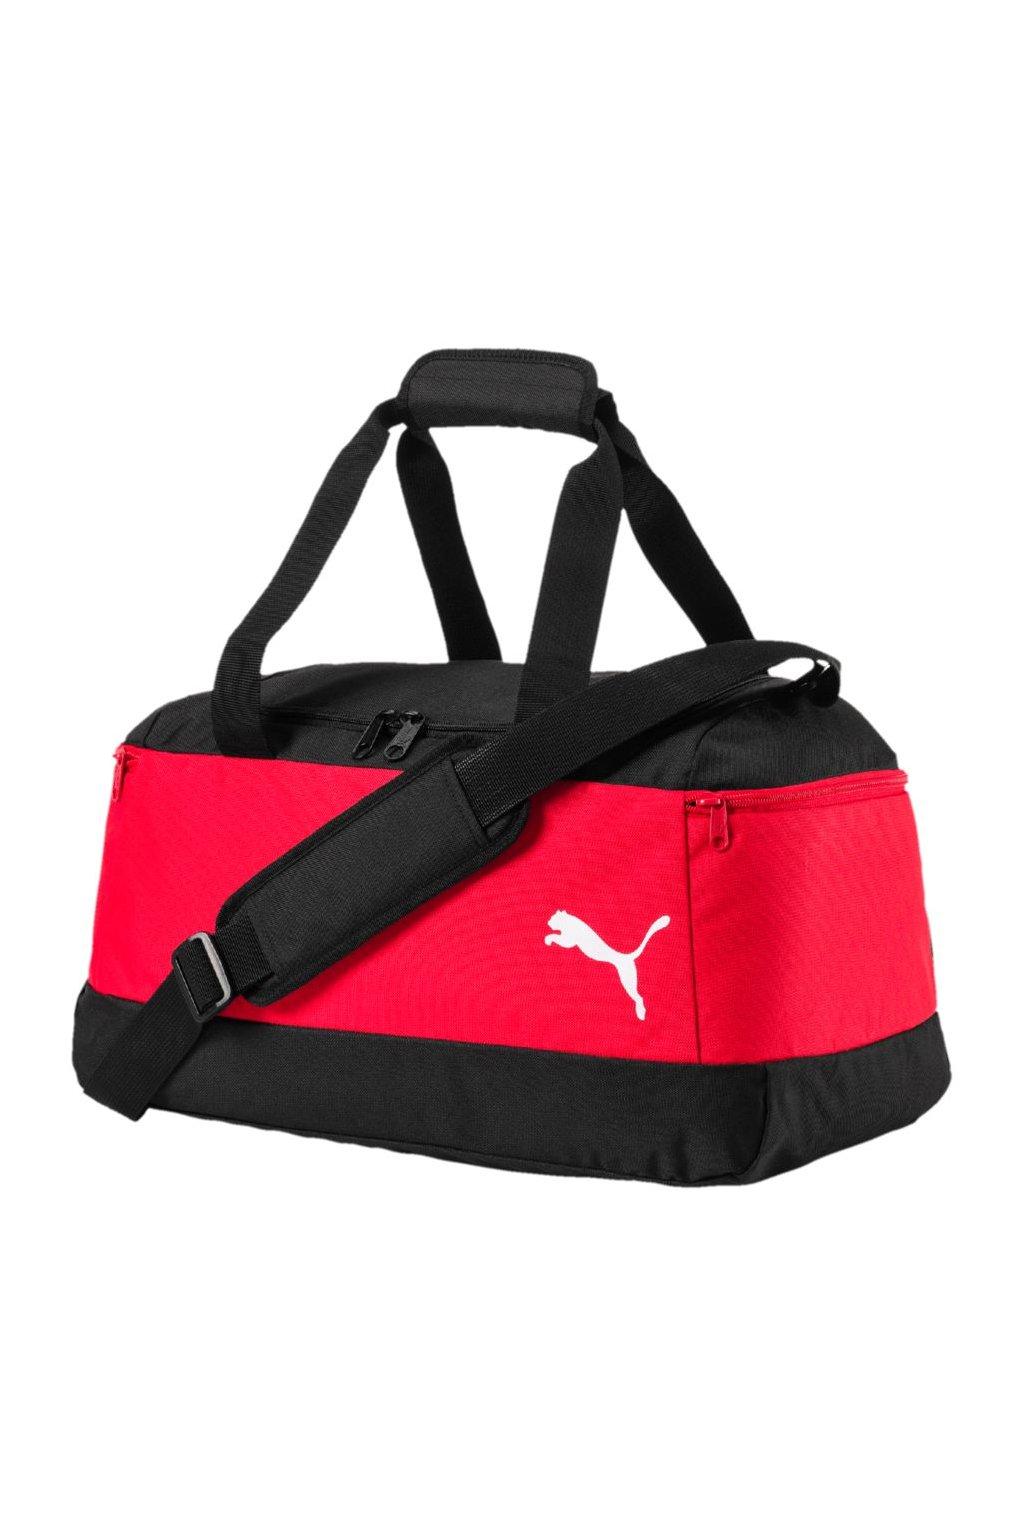 Taška Puma Pro Training II Small červená 074896 02